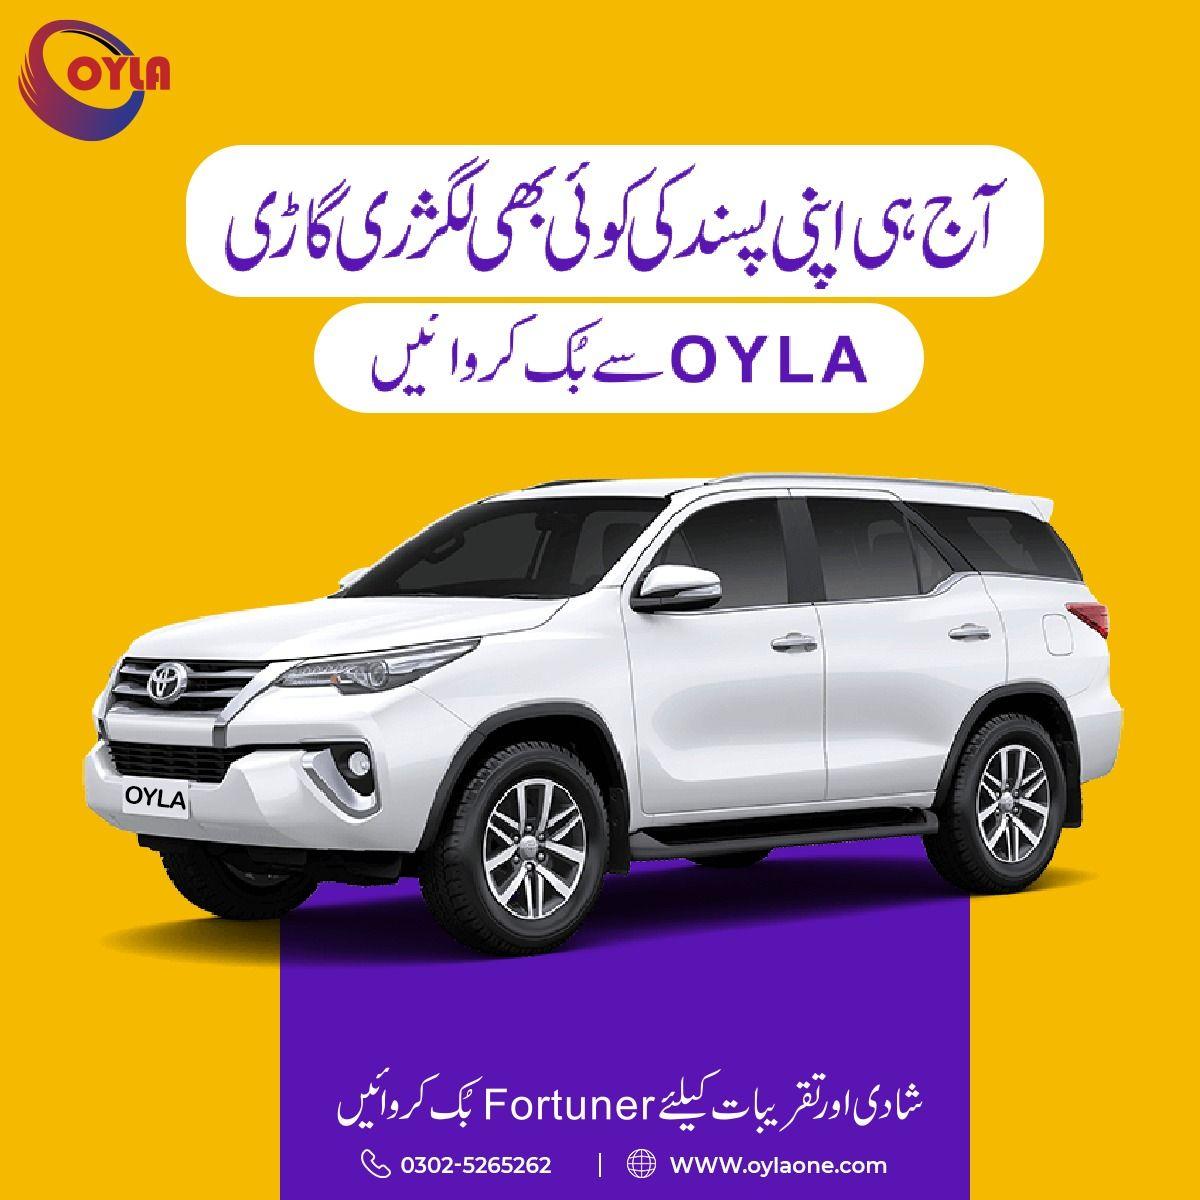 Luxury Cars Like Land Cruiser V8, Prado, Toyota Fortuner